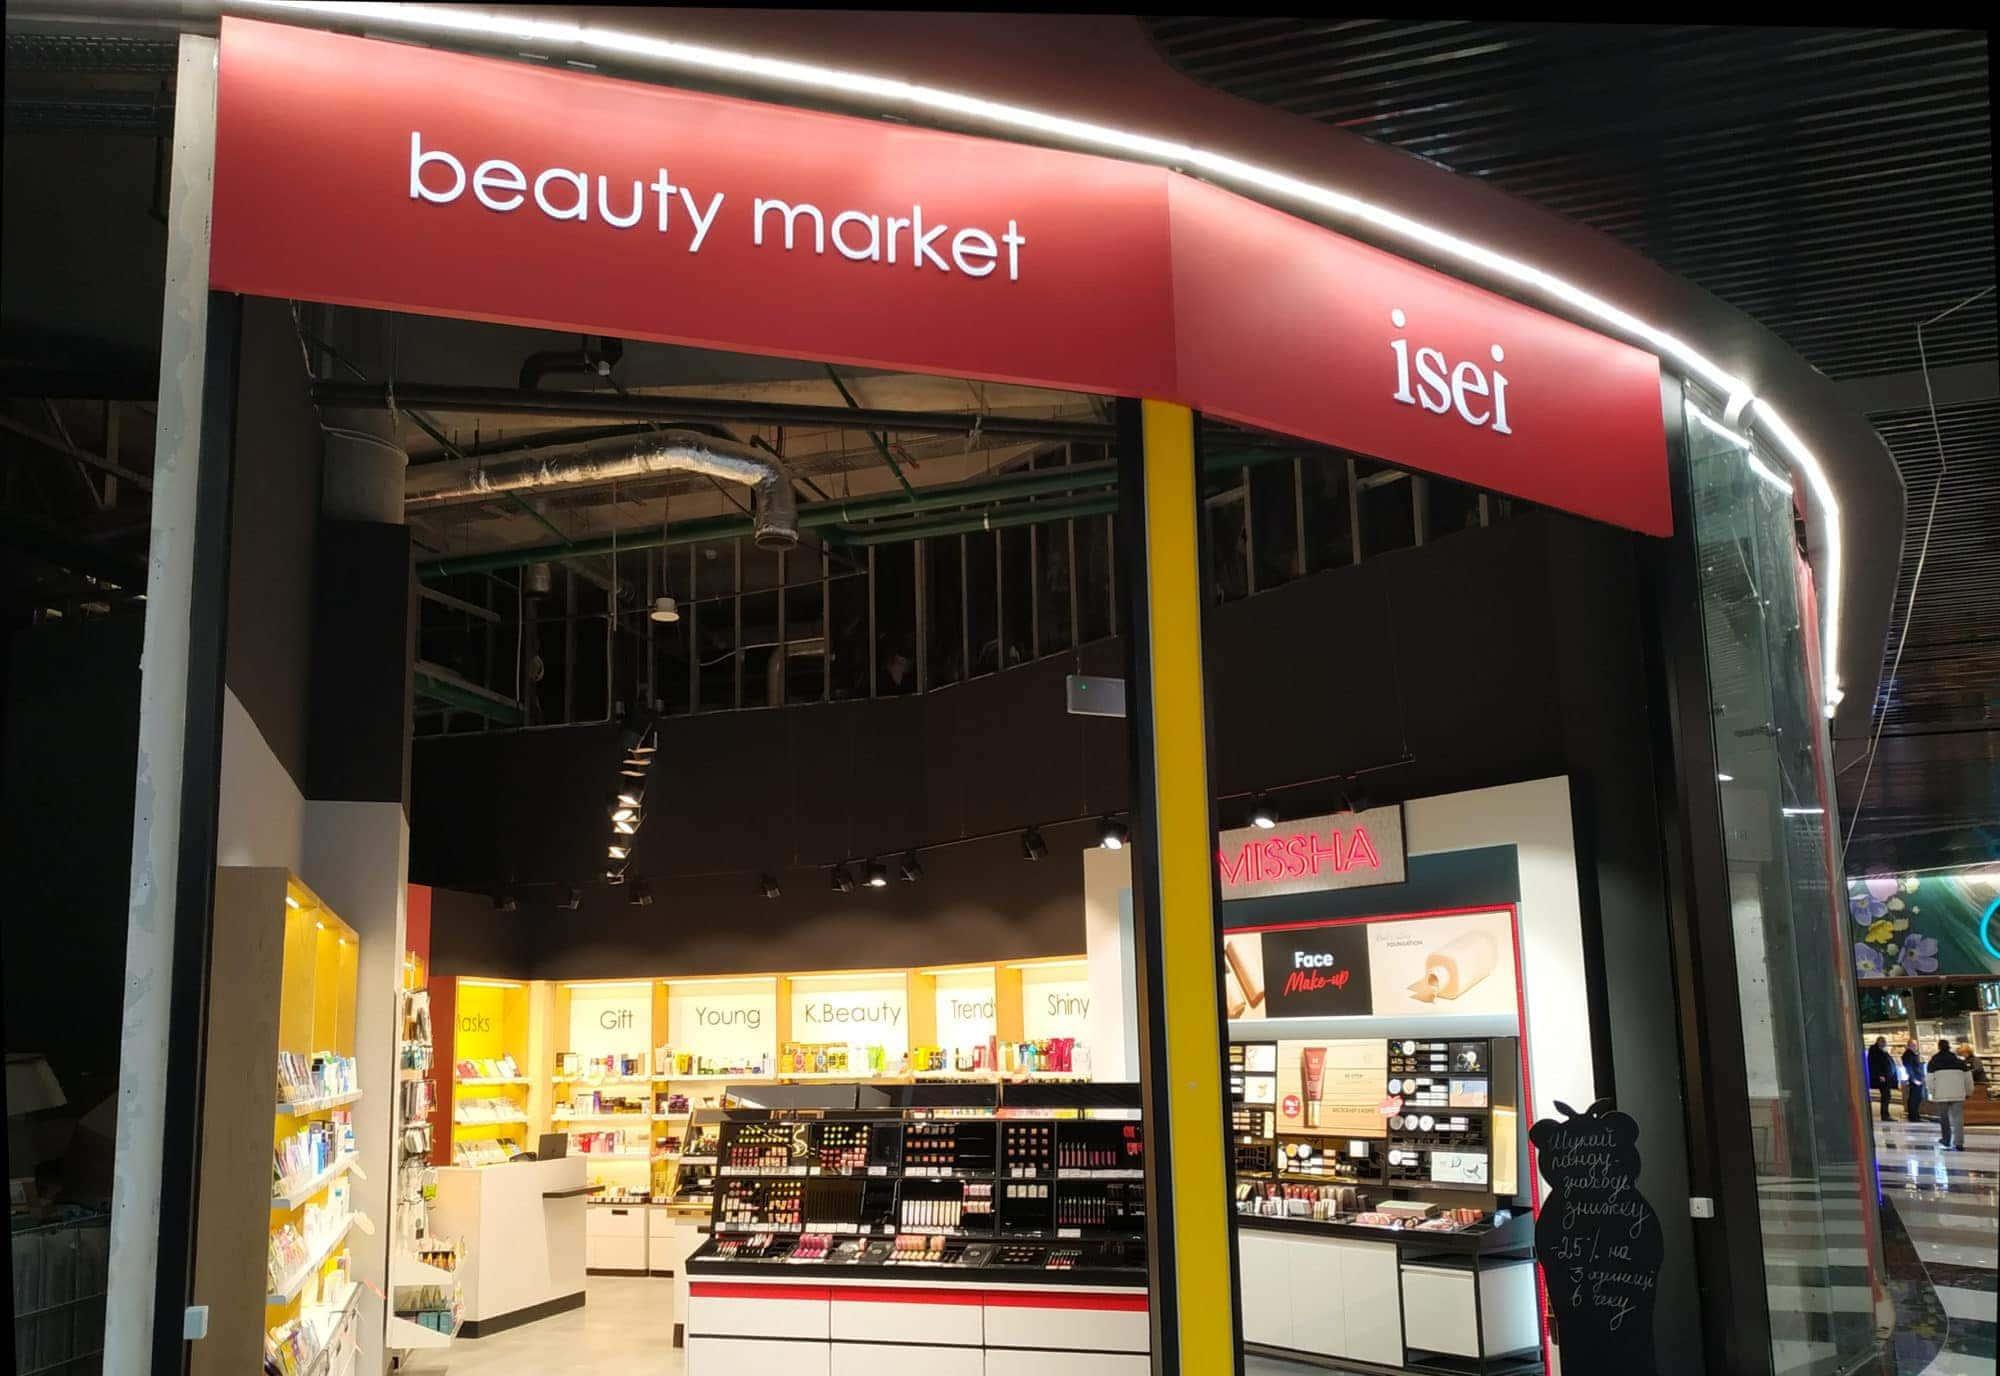 Beauty Market ISEI is already opened in Blockbuster Mall